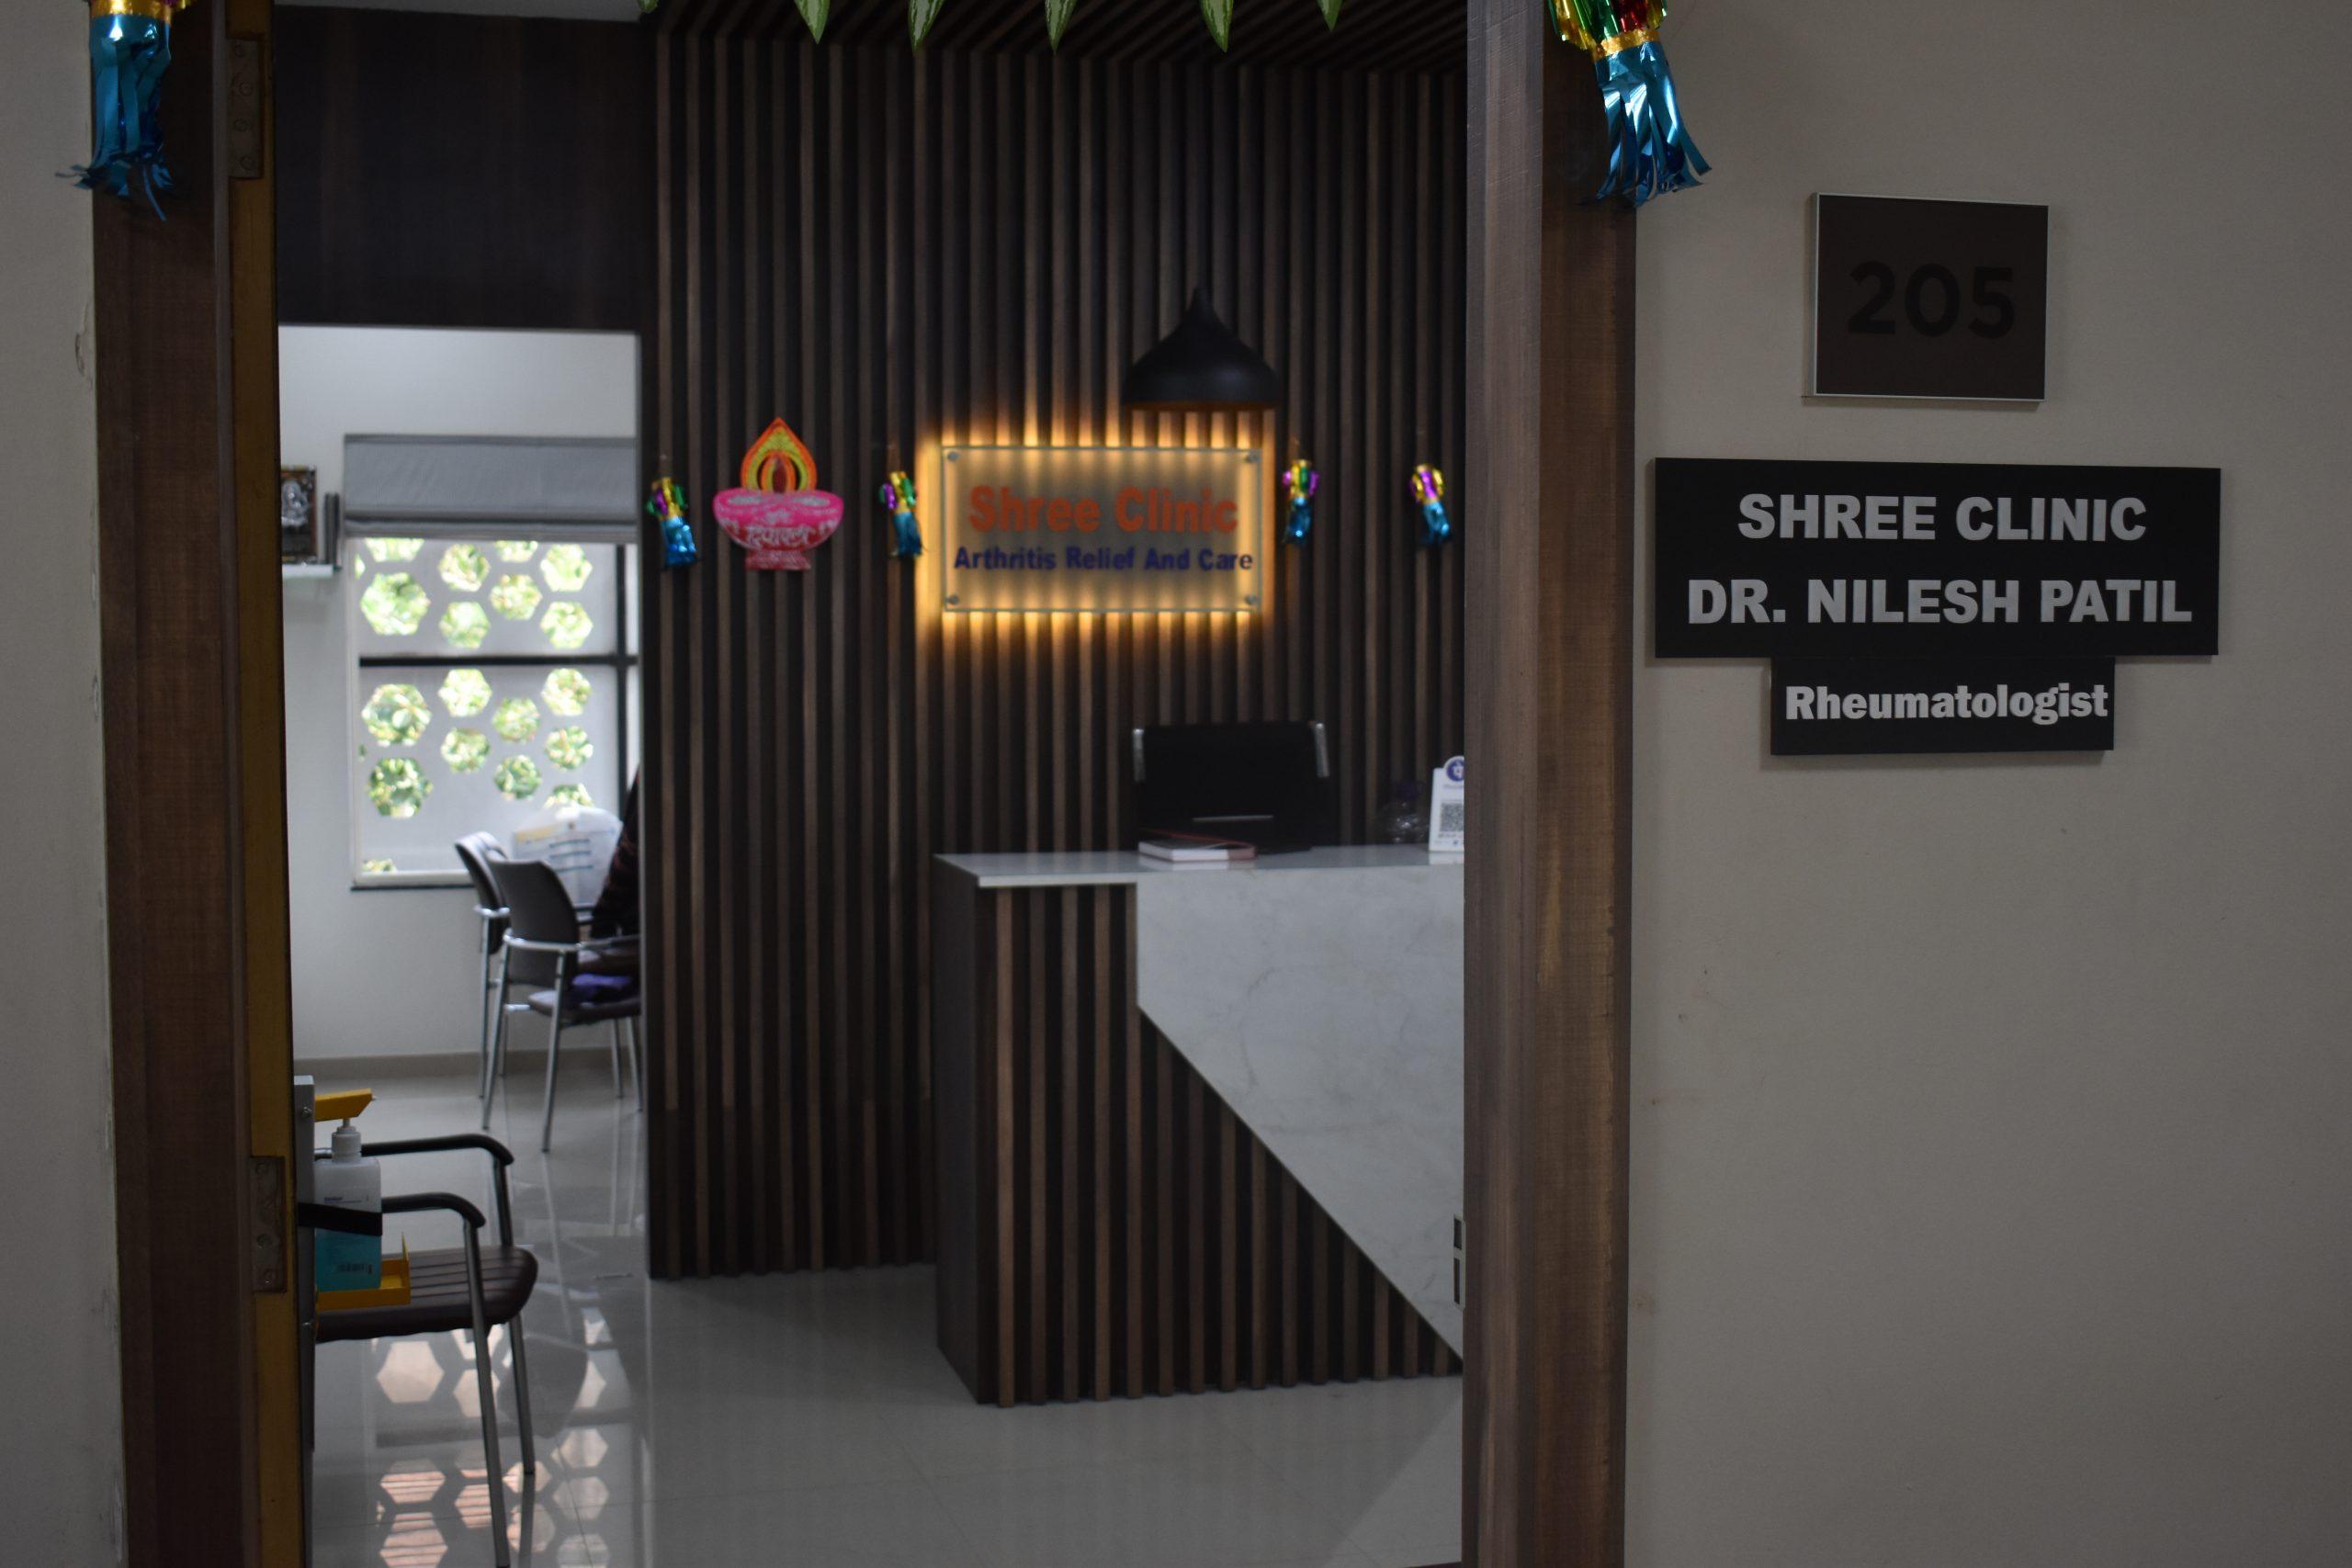 Best Doctor for Rheumatologist in Pune